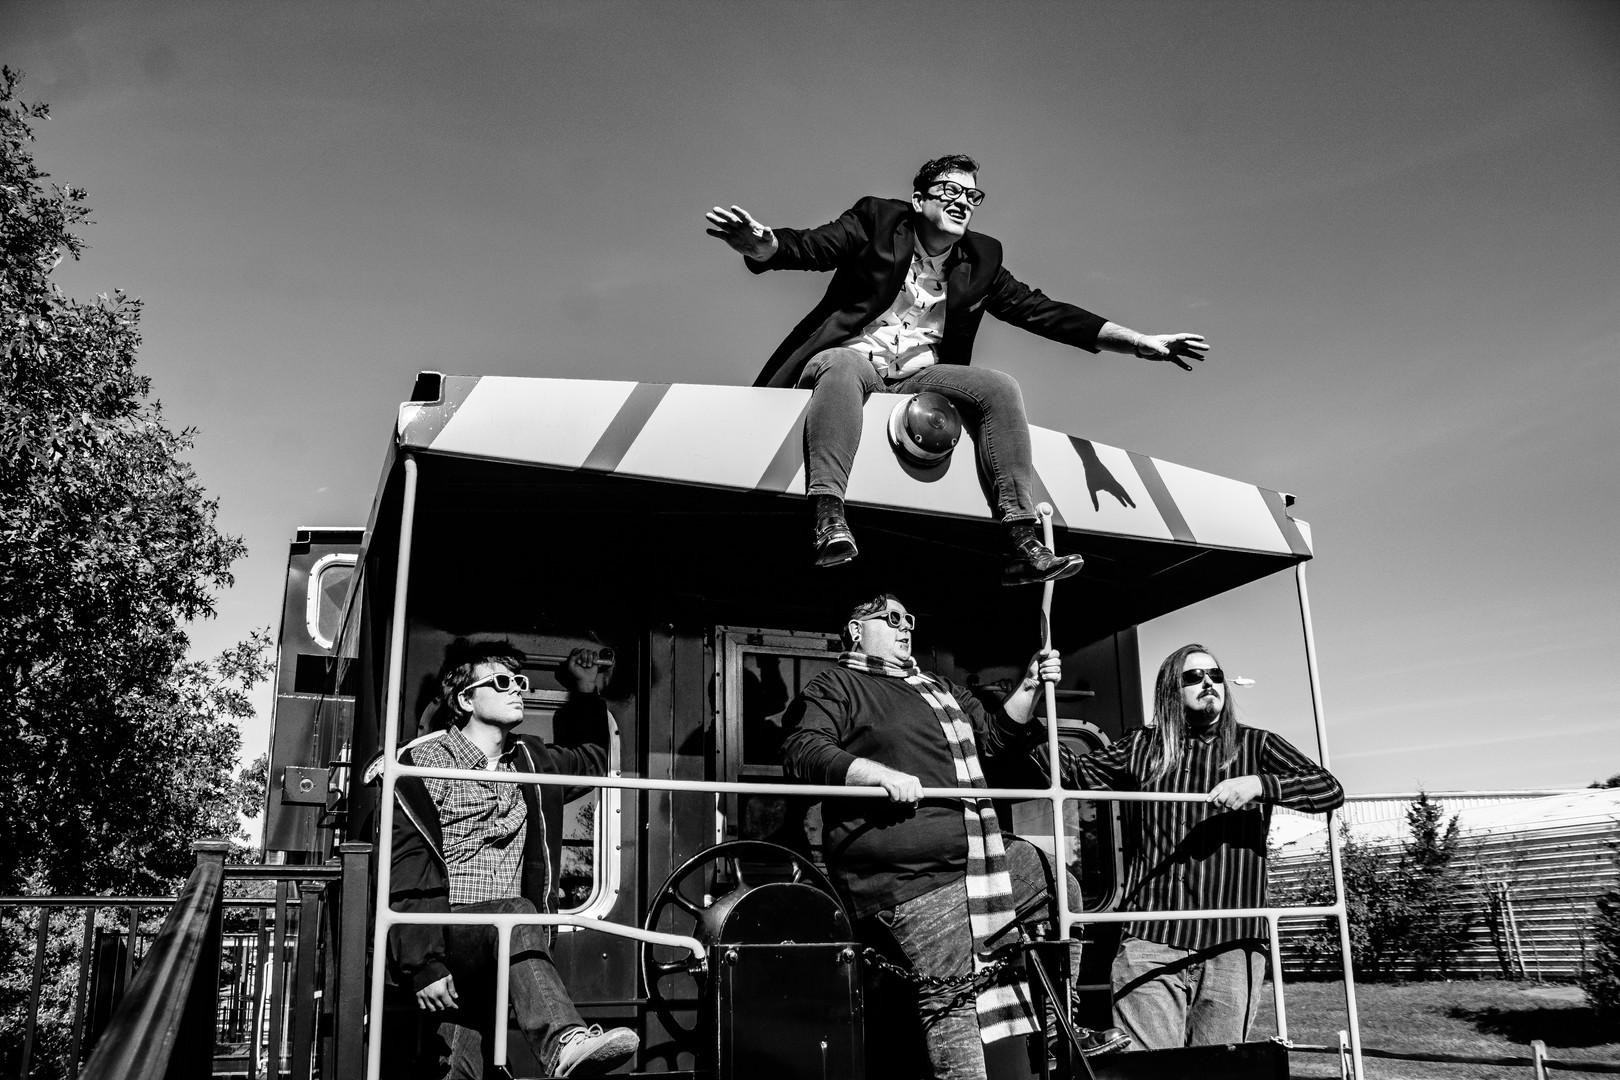 Vivid Vertigo on track to bring rock back!